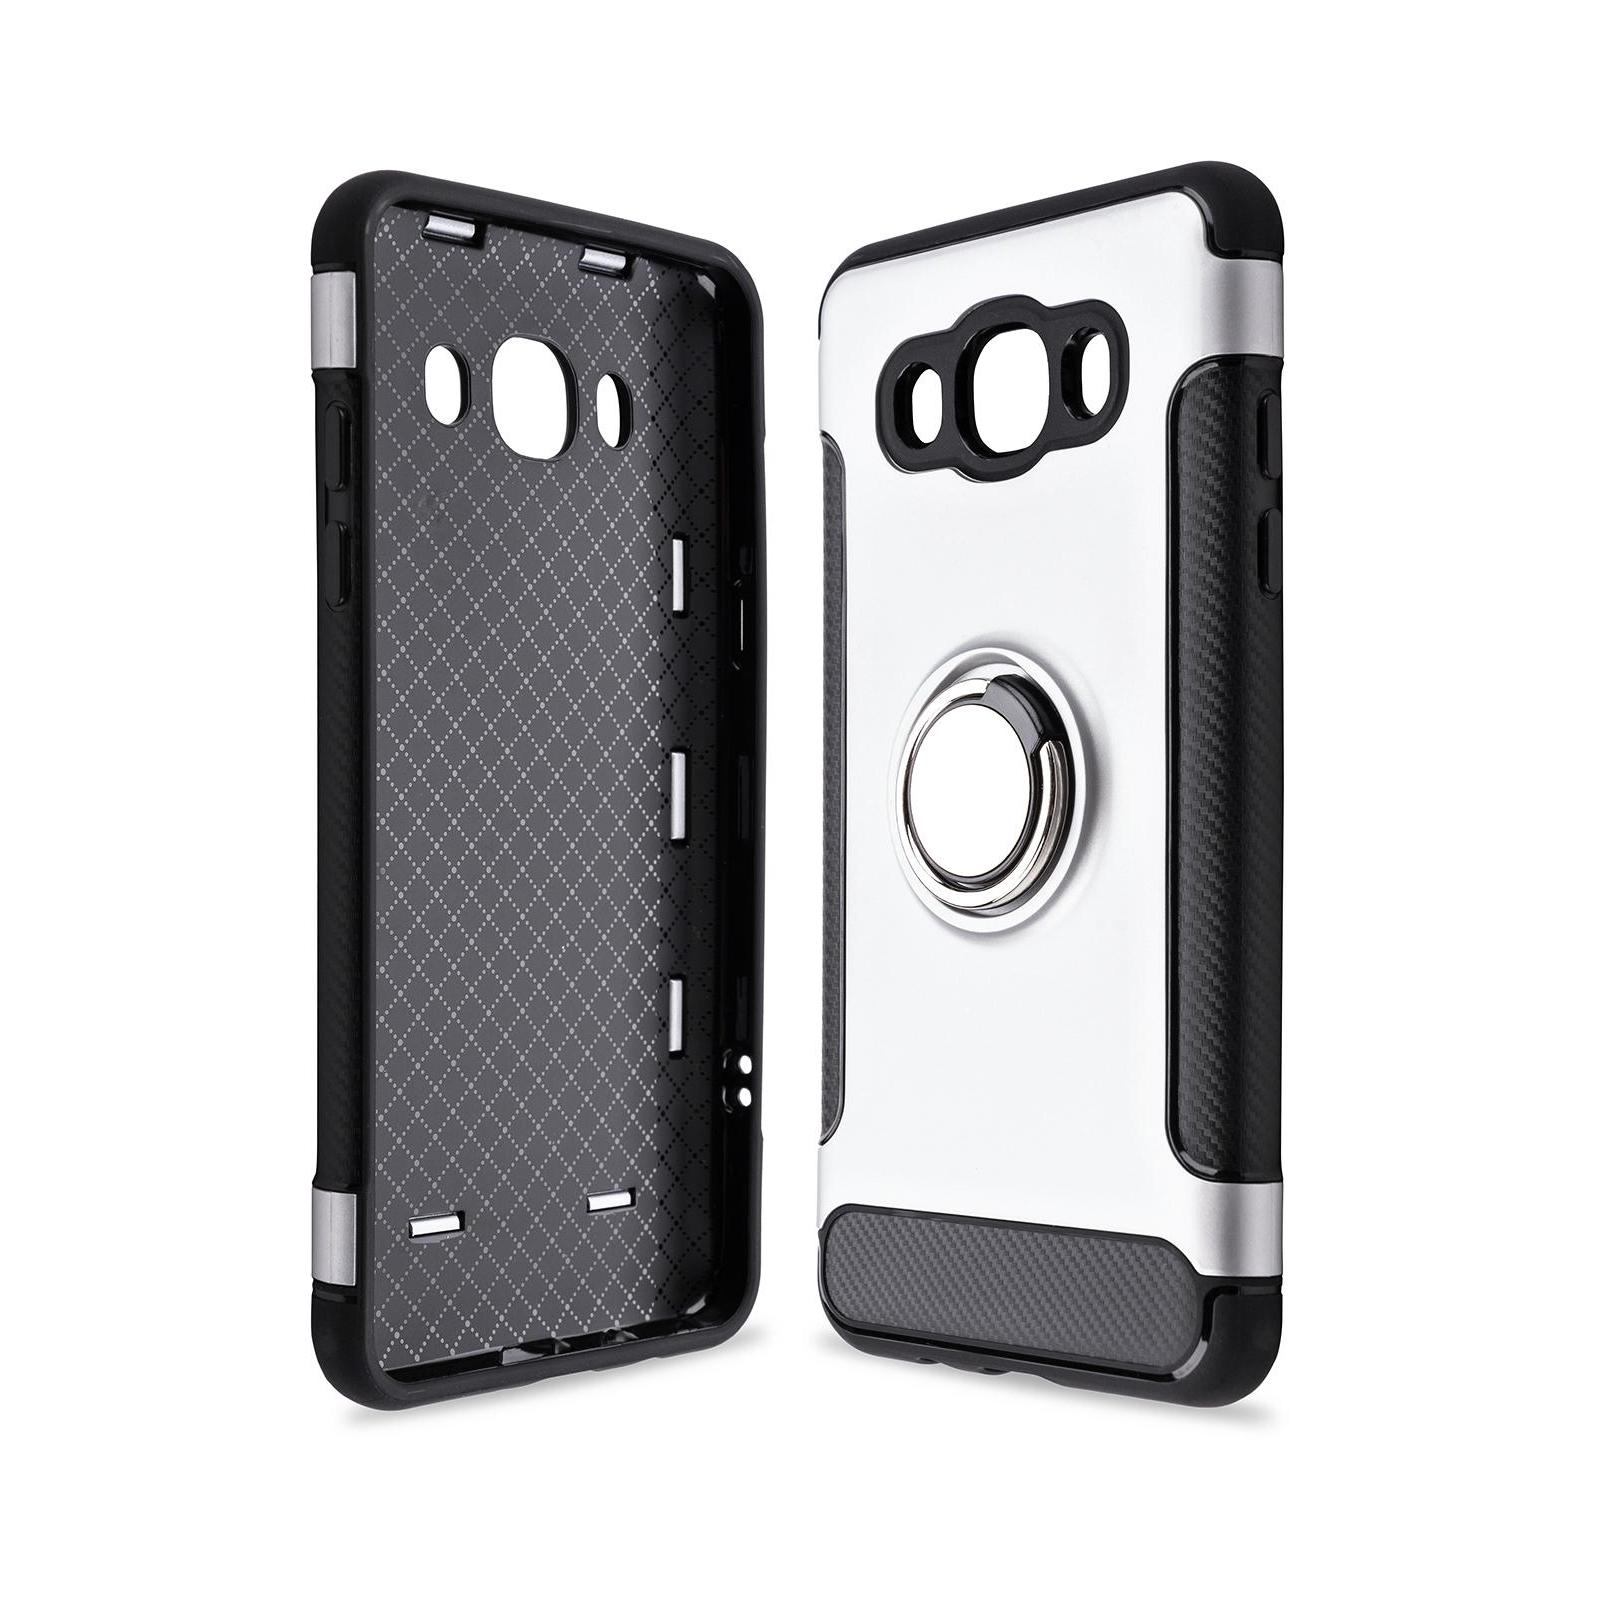 Чехол для моб. телефона Laudtec для Samsung J5 2016/J510 Ring stand (silver) (LR-J510-SR)